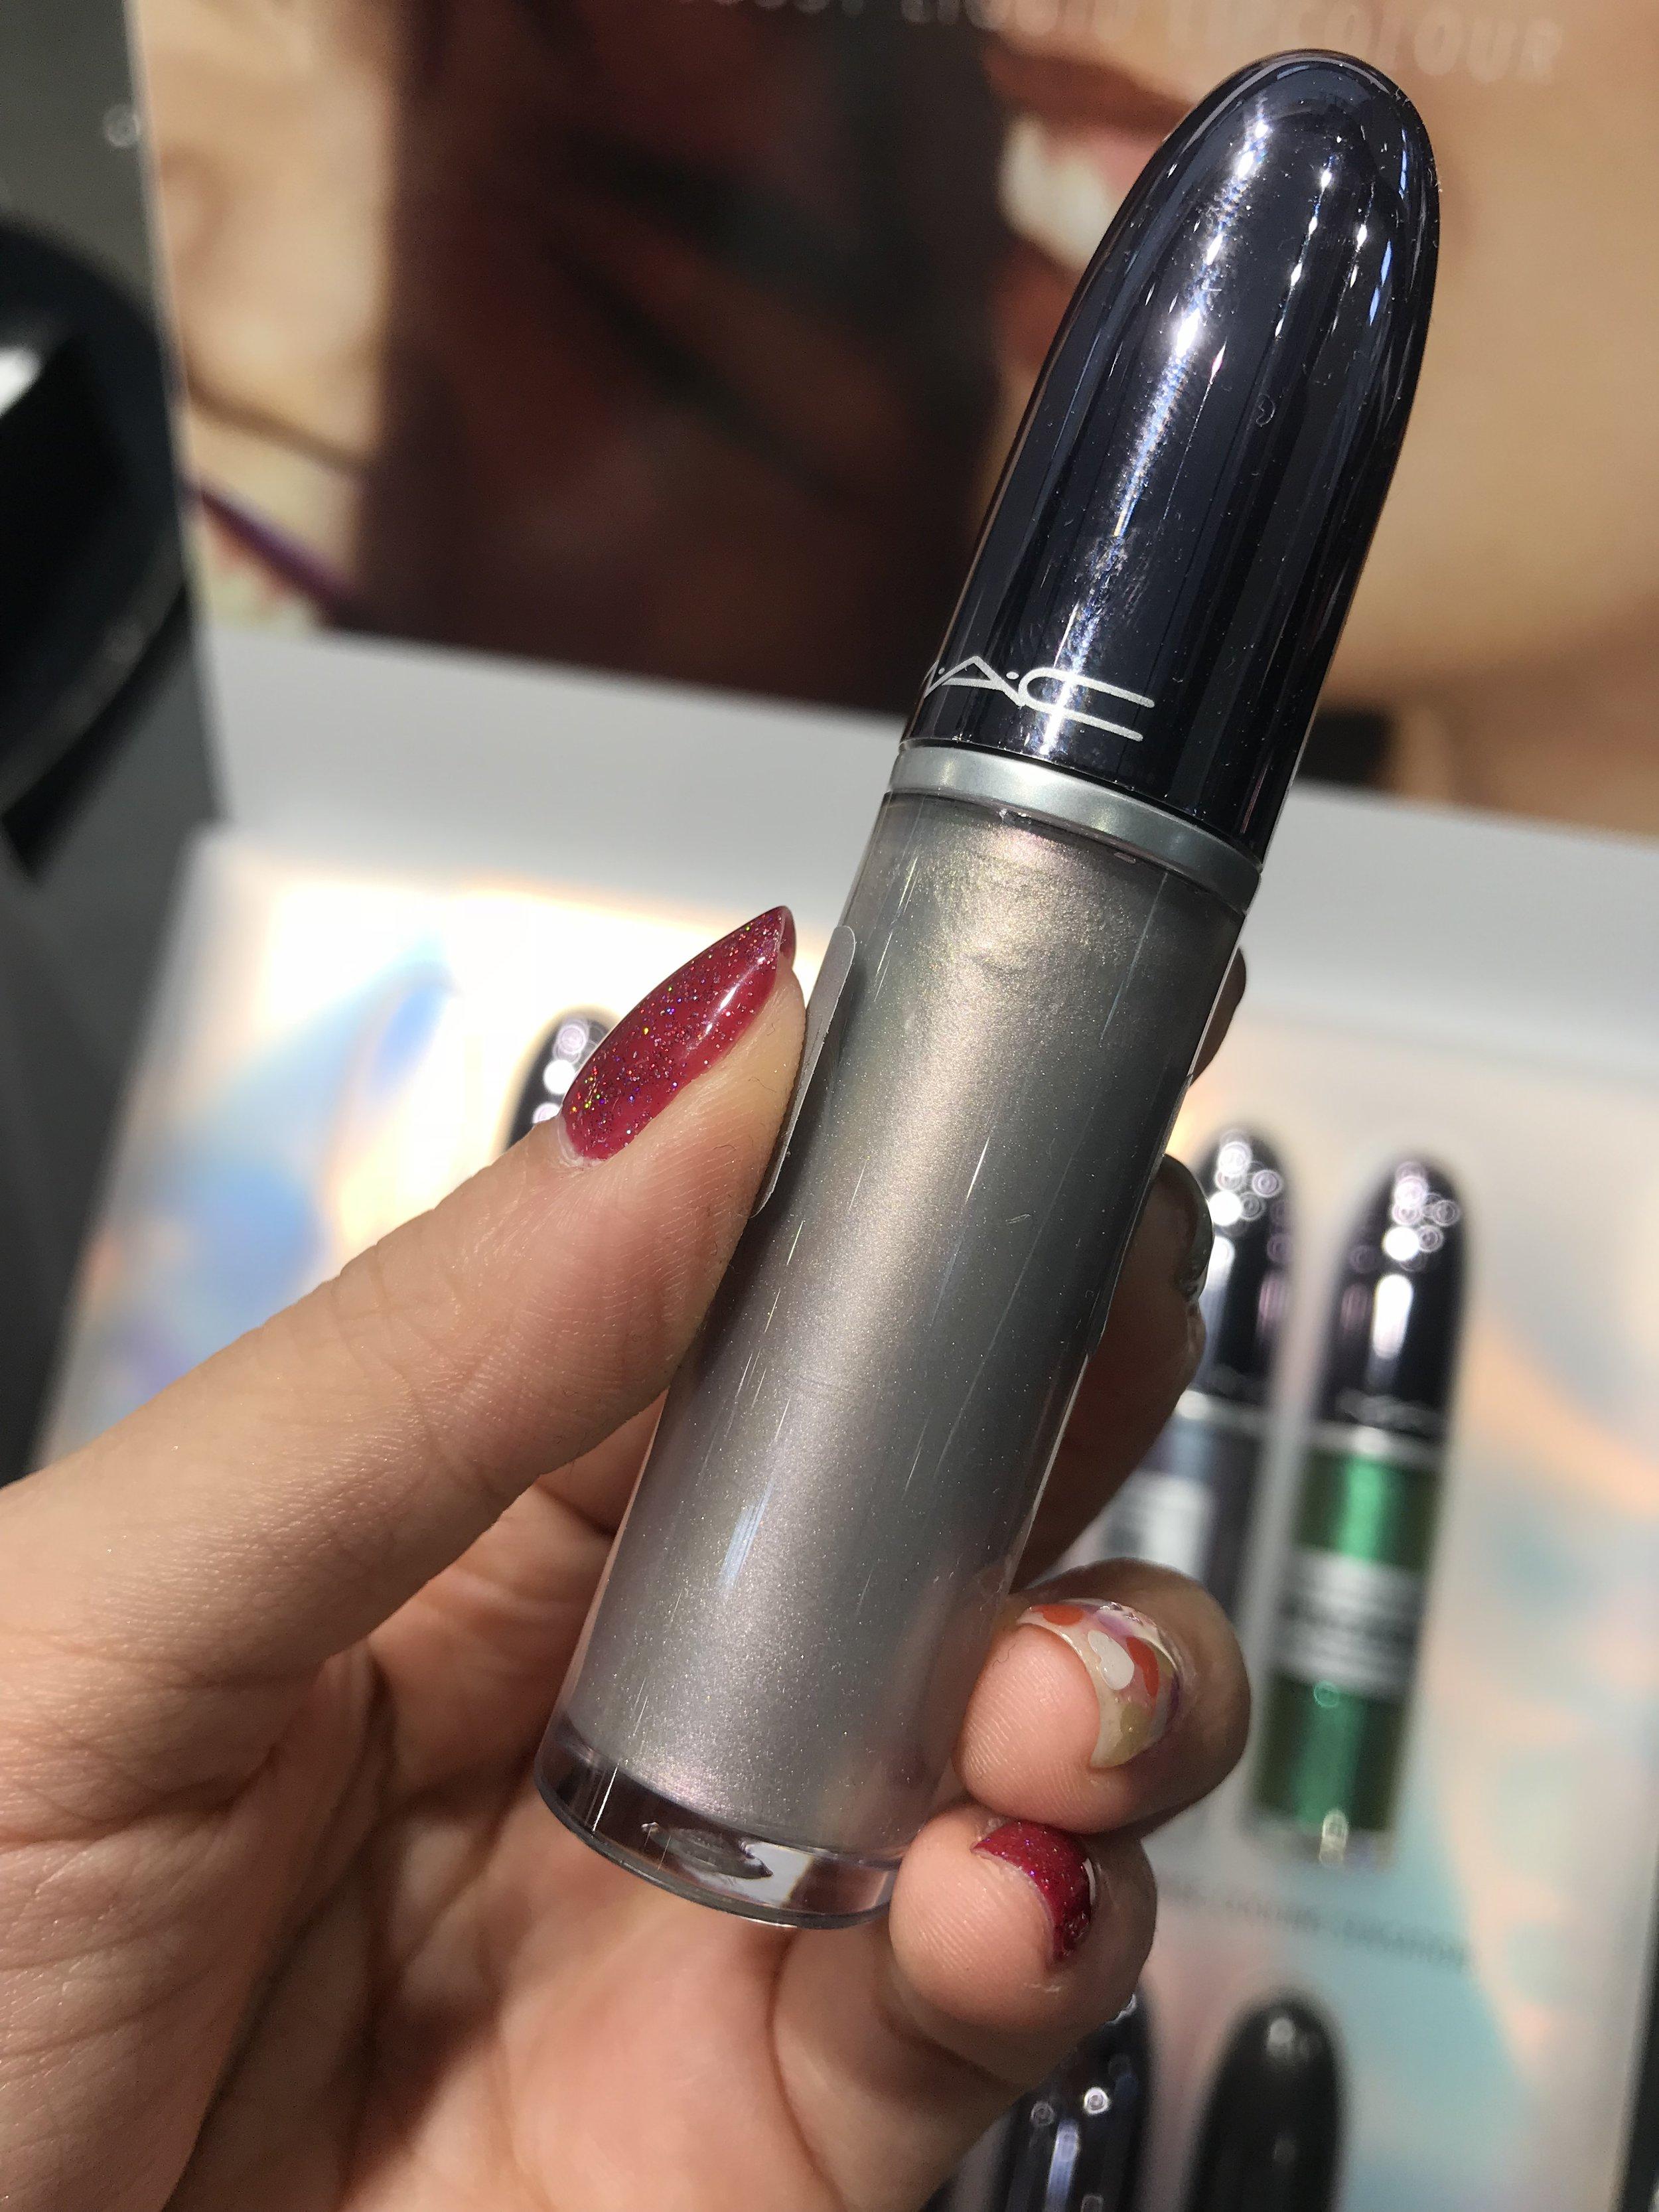 Mac Grand Illusion lipsticks Broken Halo